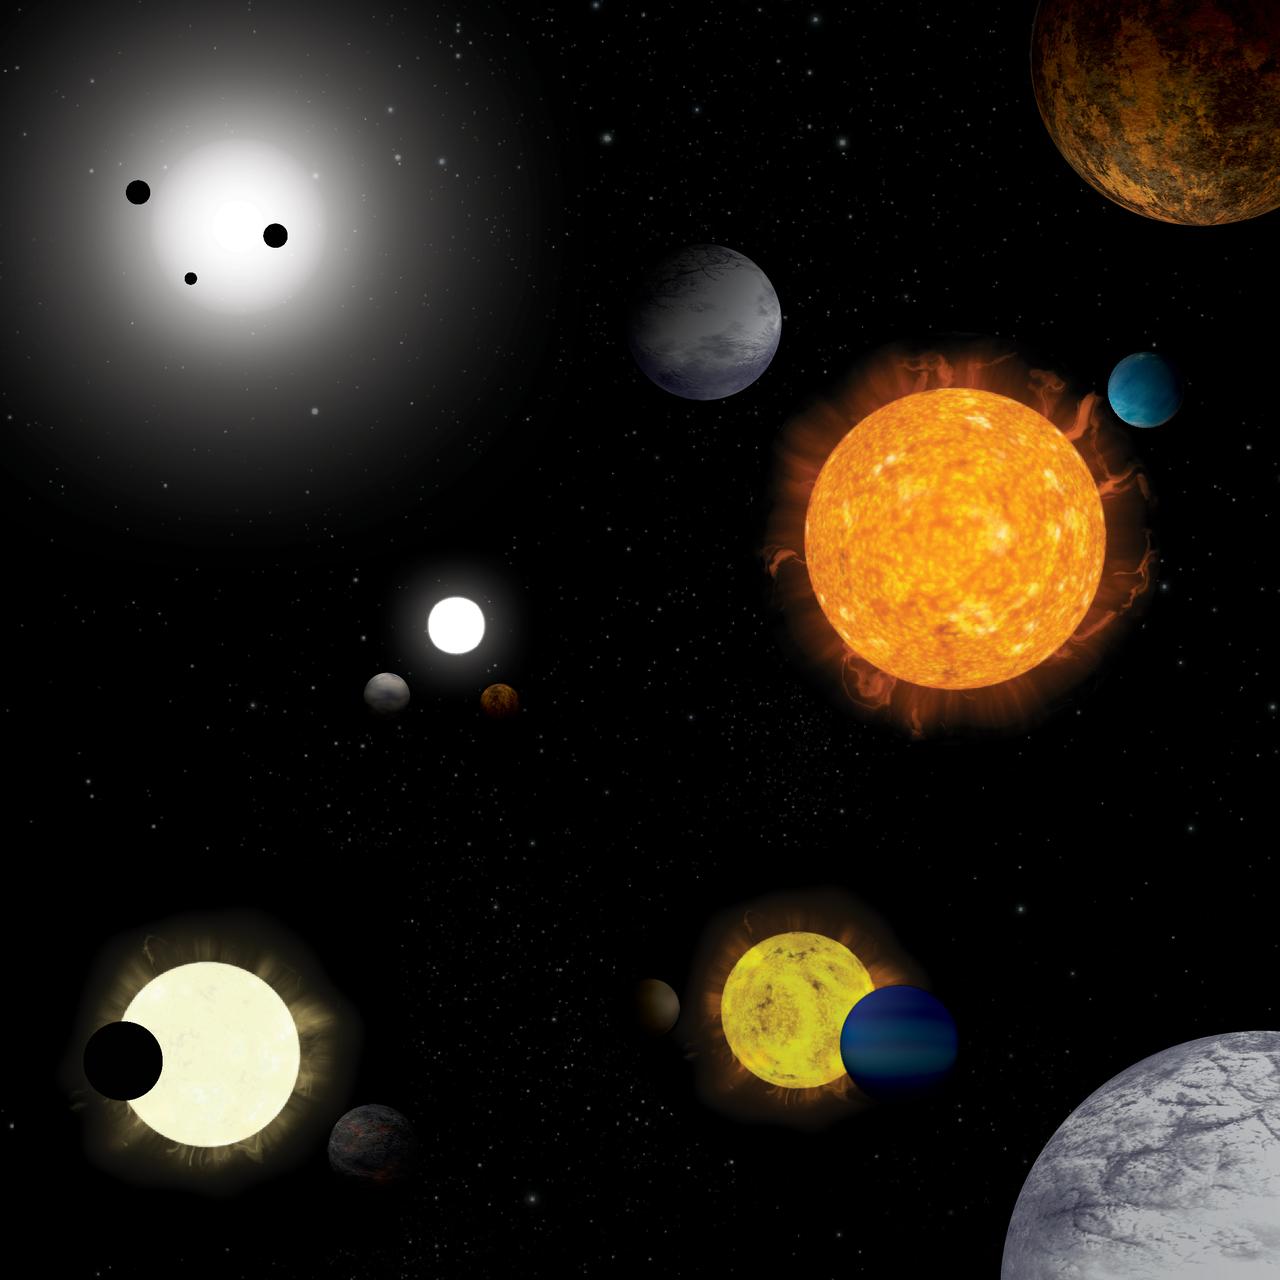 1567214022257-CHEOPS_Exoplanet_imaginarium_sqr_1280.jpg